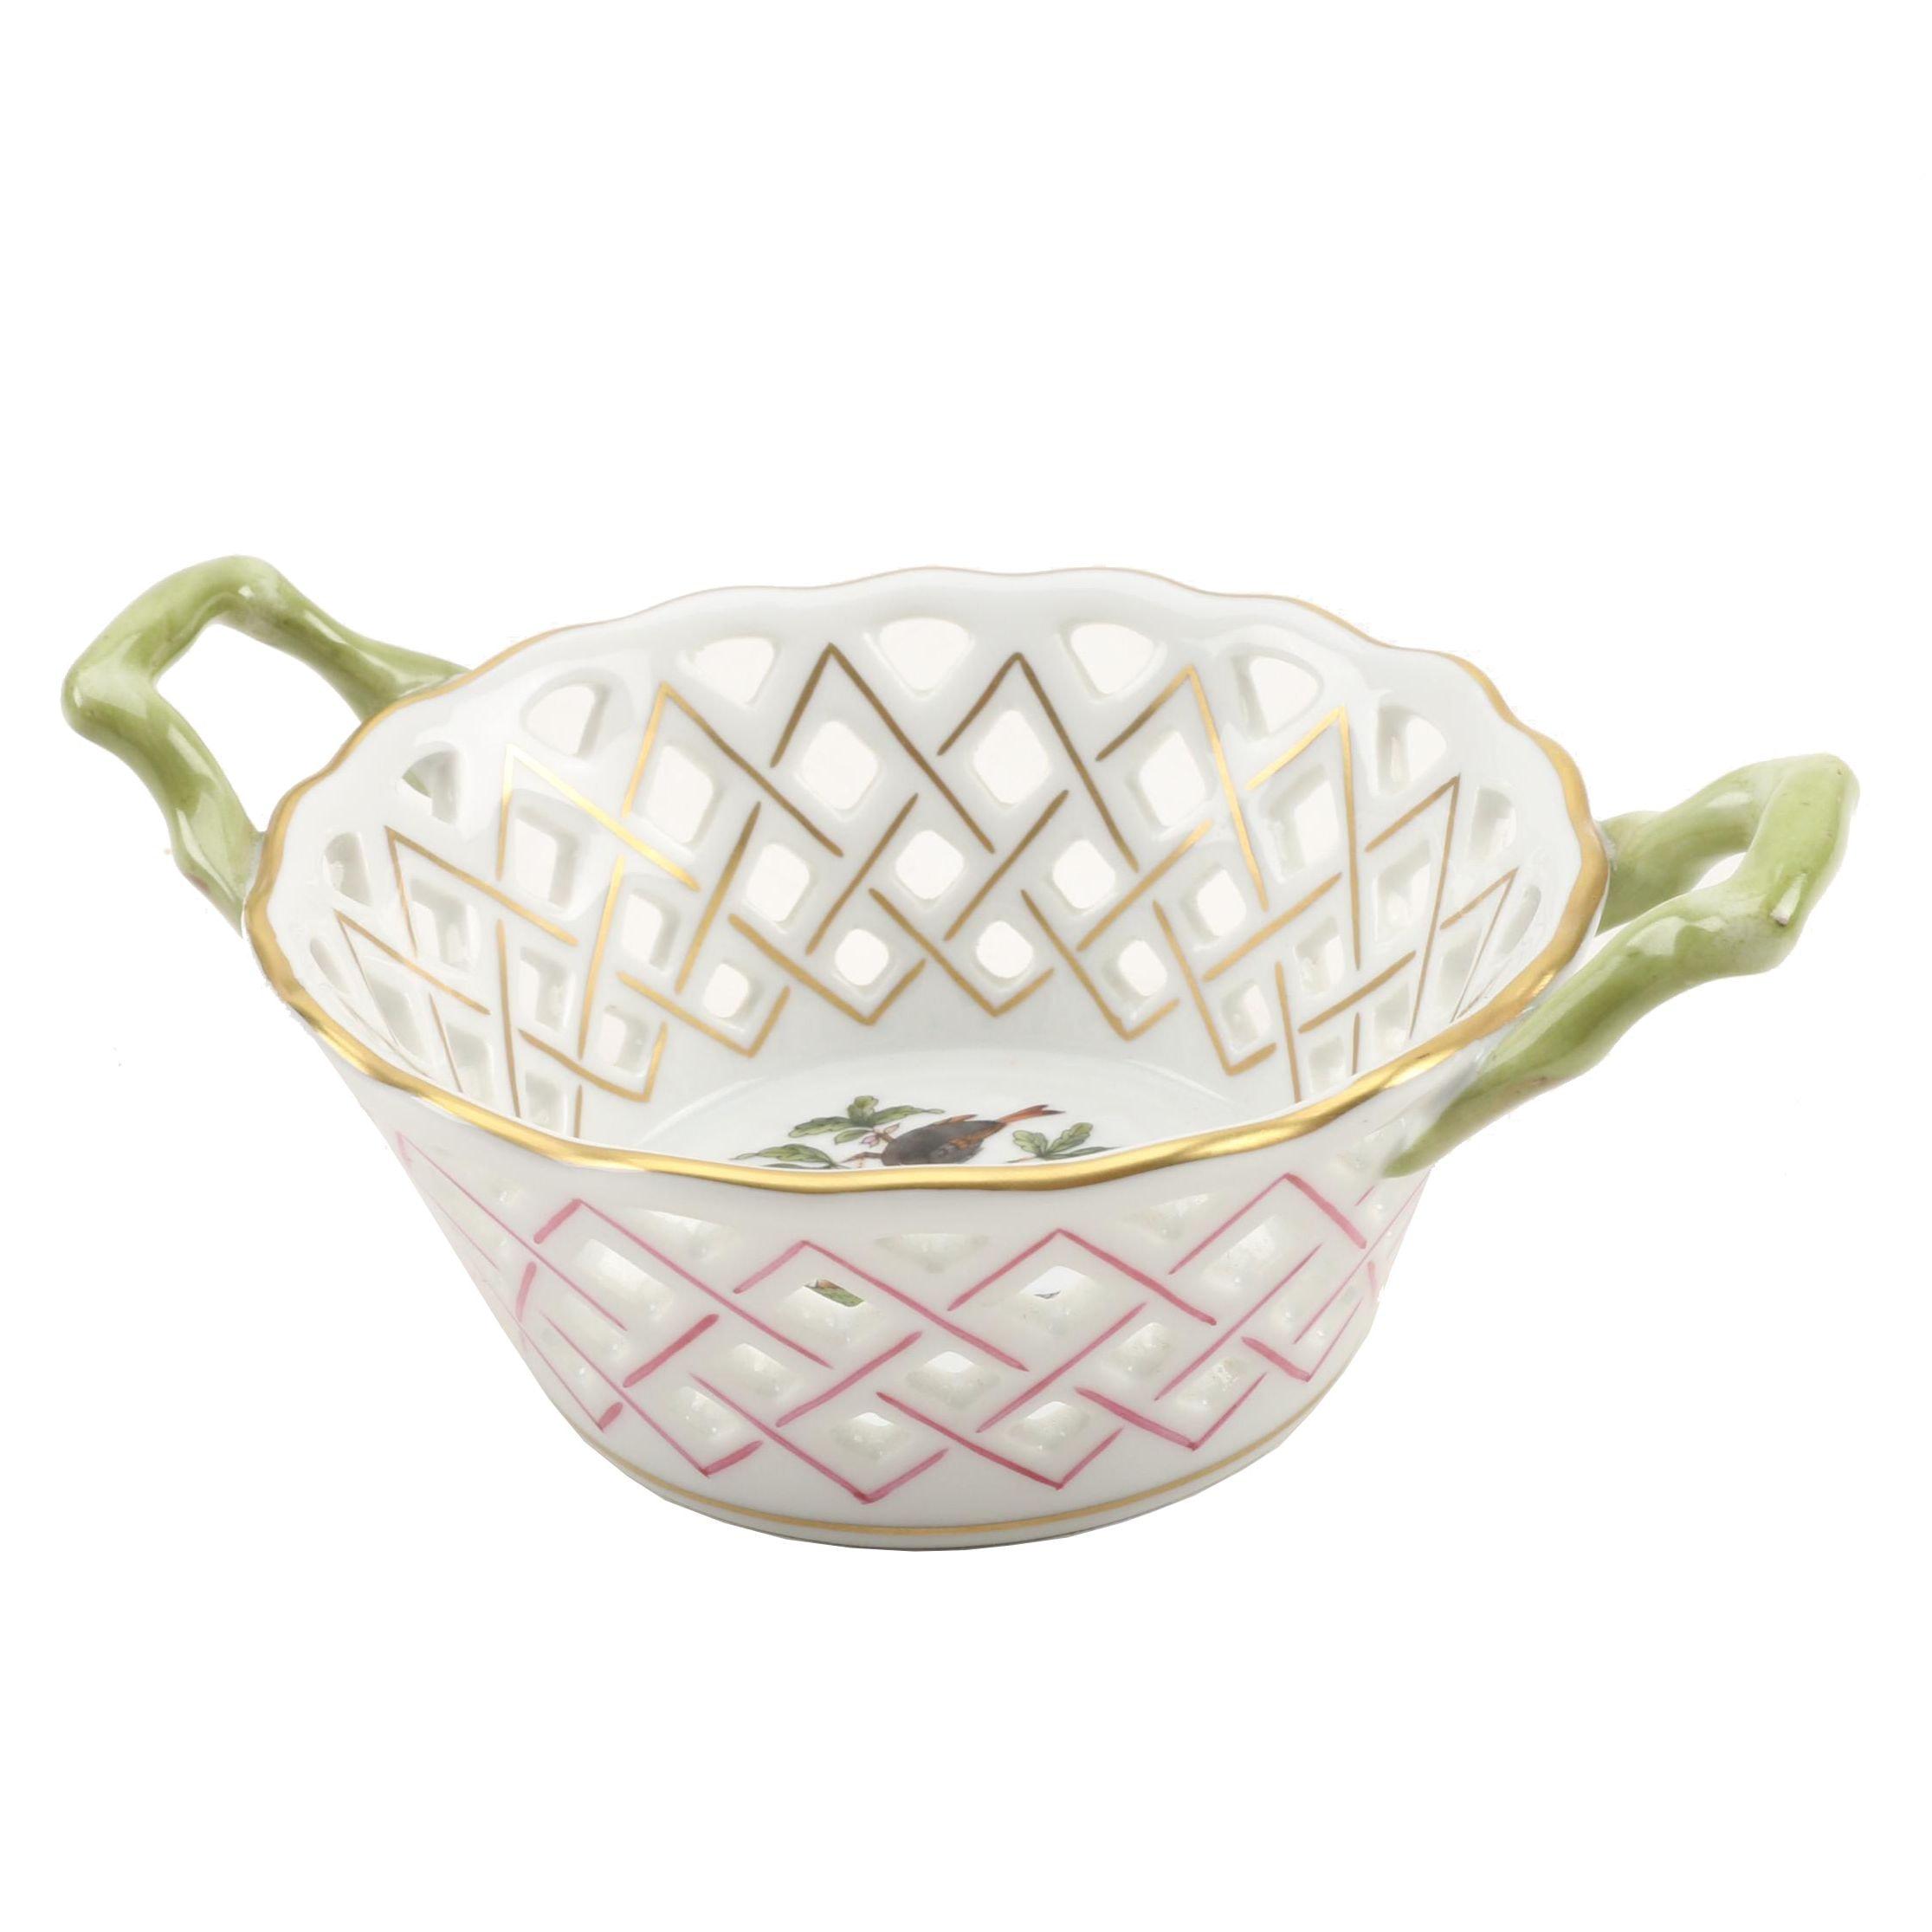 "Herend ""Rothschild Bird"" Porcelain Round Open Weave Basket with Handles"